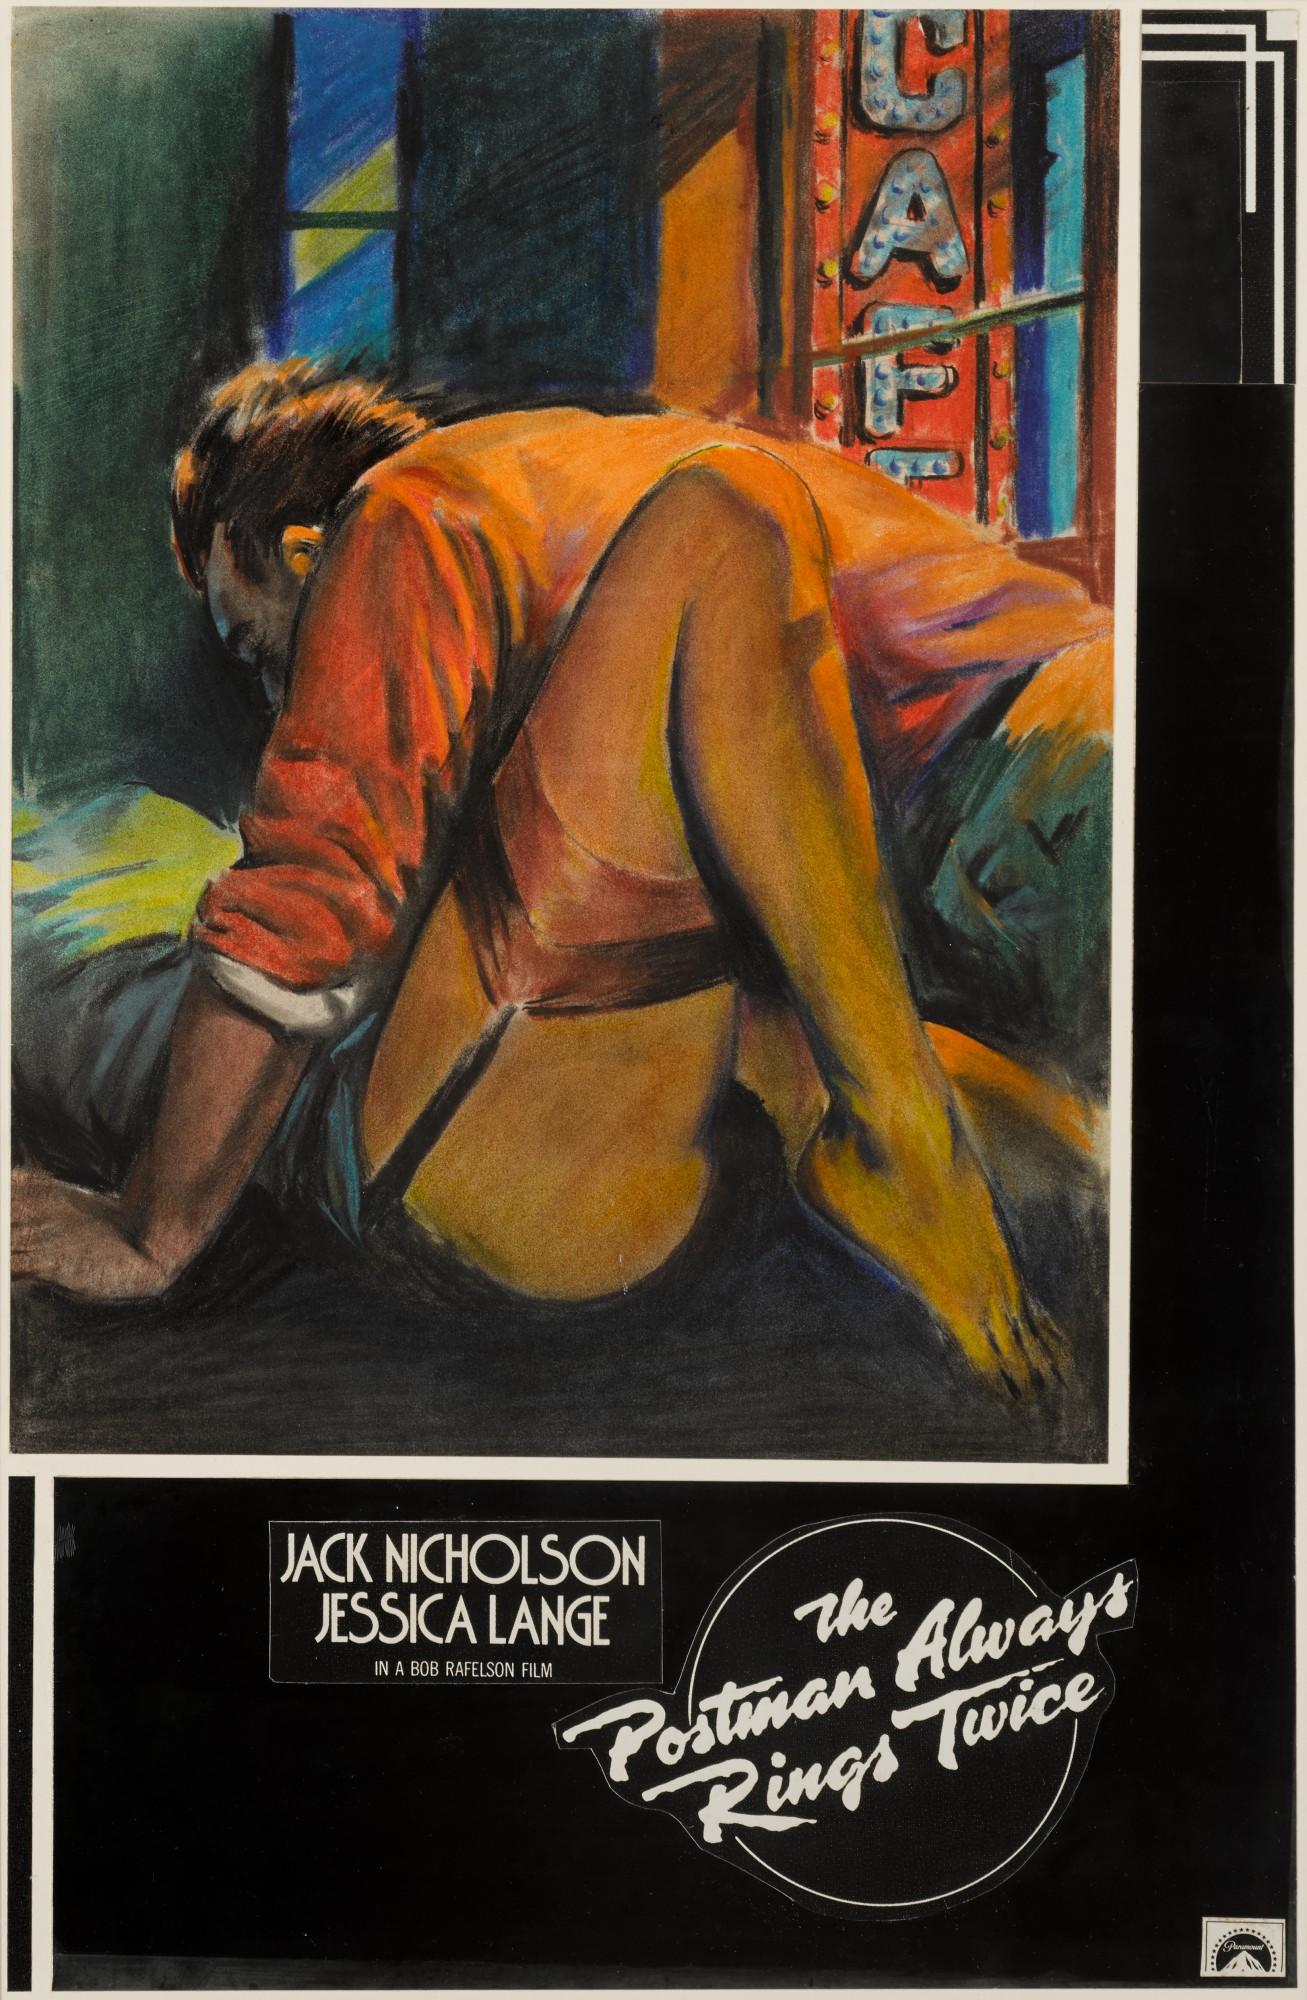 THE POSTMAN ALWAYS RINGS TWICE (1981) ORIGINAL ARTWORK, BRITISH